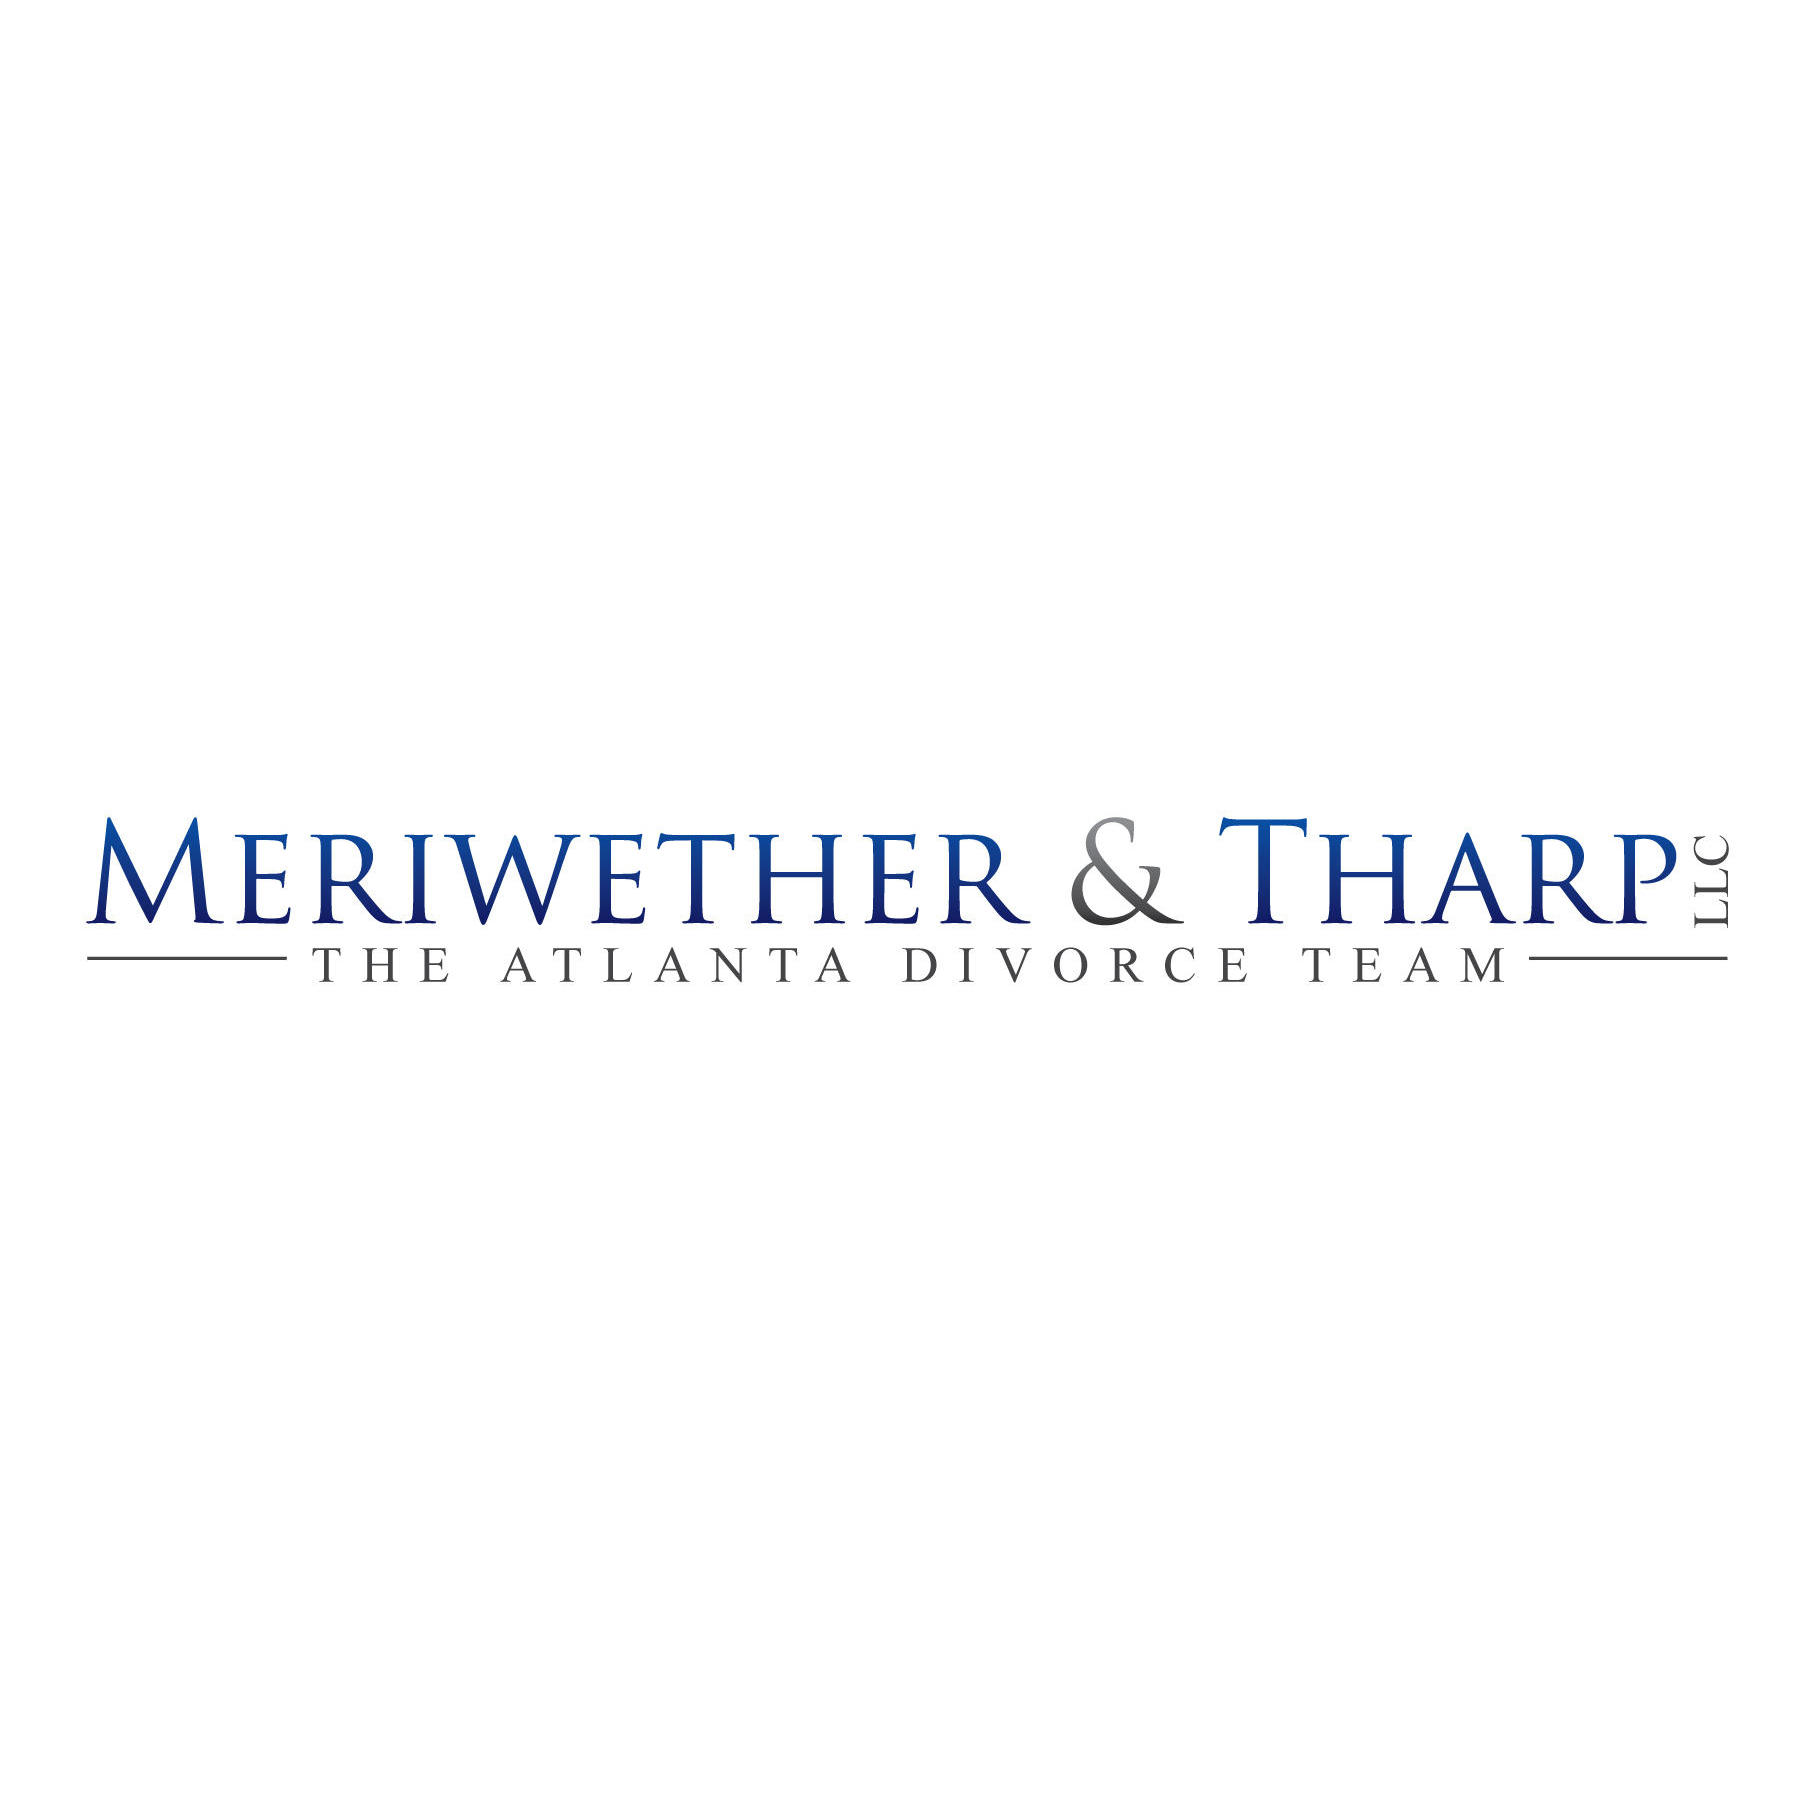 Meriwether & Tharp, LLC - Johns Creek , GA